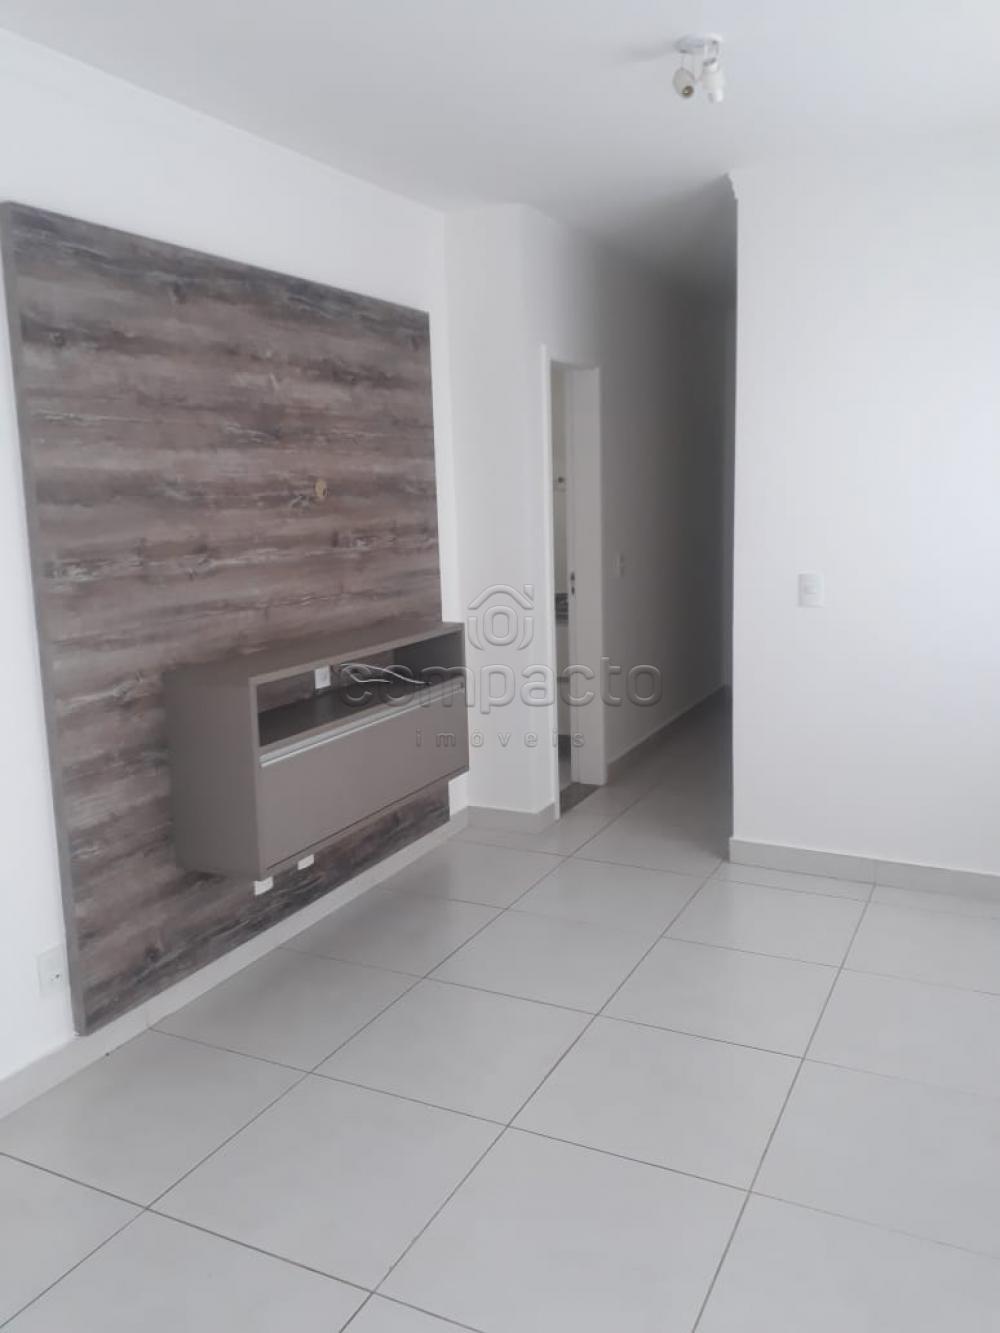 Sao Jose do Rio Preto Apartamento Locacao R$ 1.450,00 Condominio R$380,00 3 Dormitorios 1 Suite Area construida 75.00m2